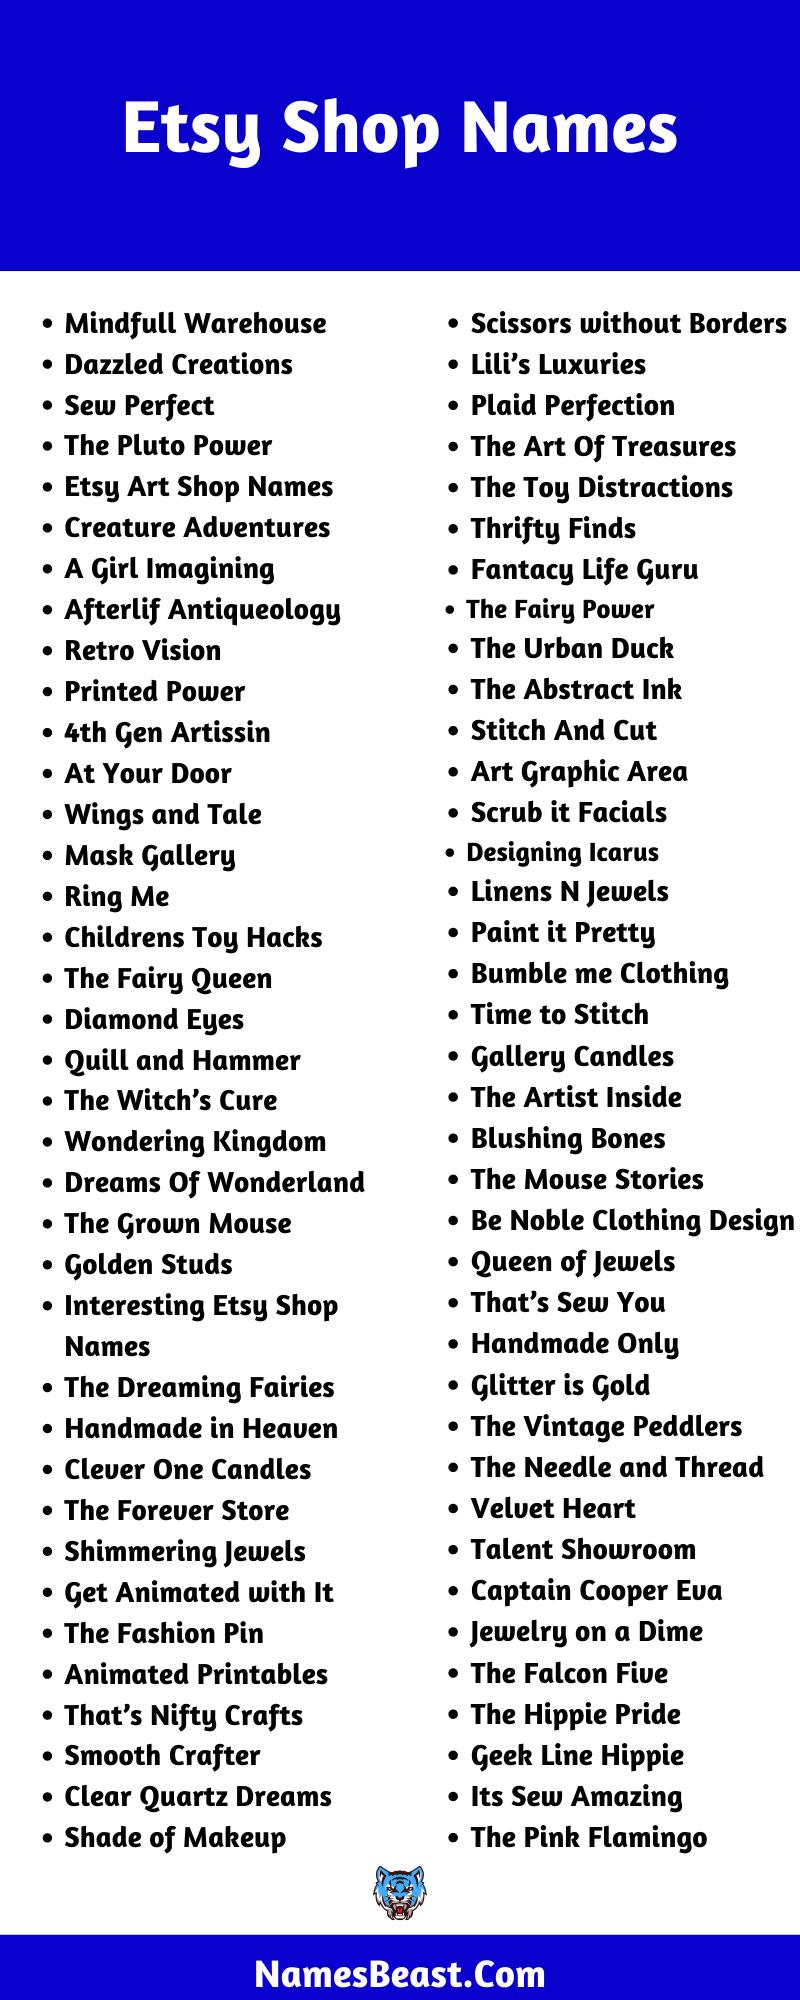 Etsy Shop Name Ideas